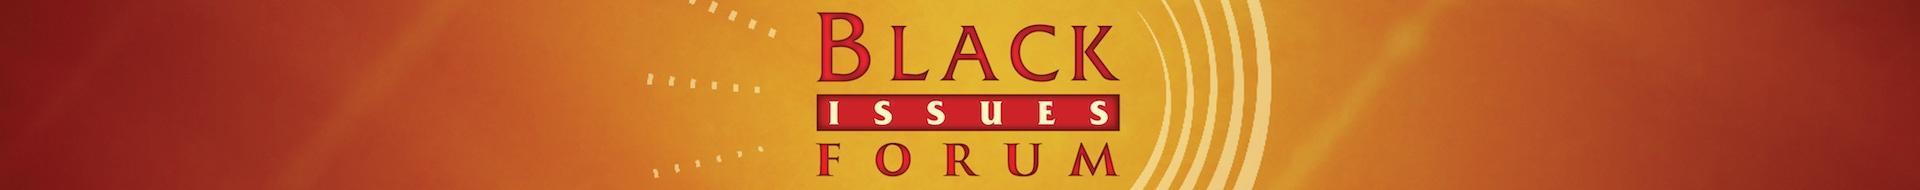 Black Issues Forum Logo Banner